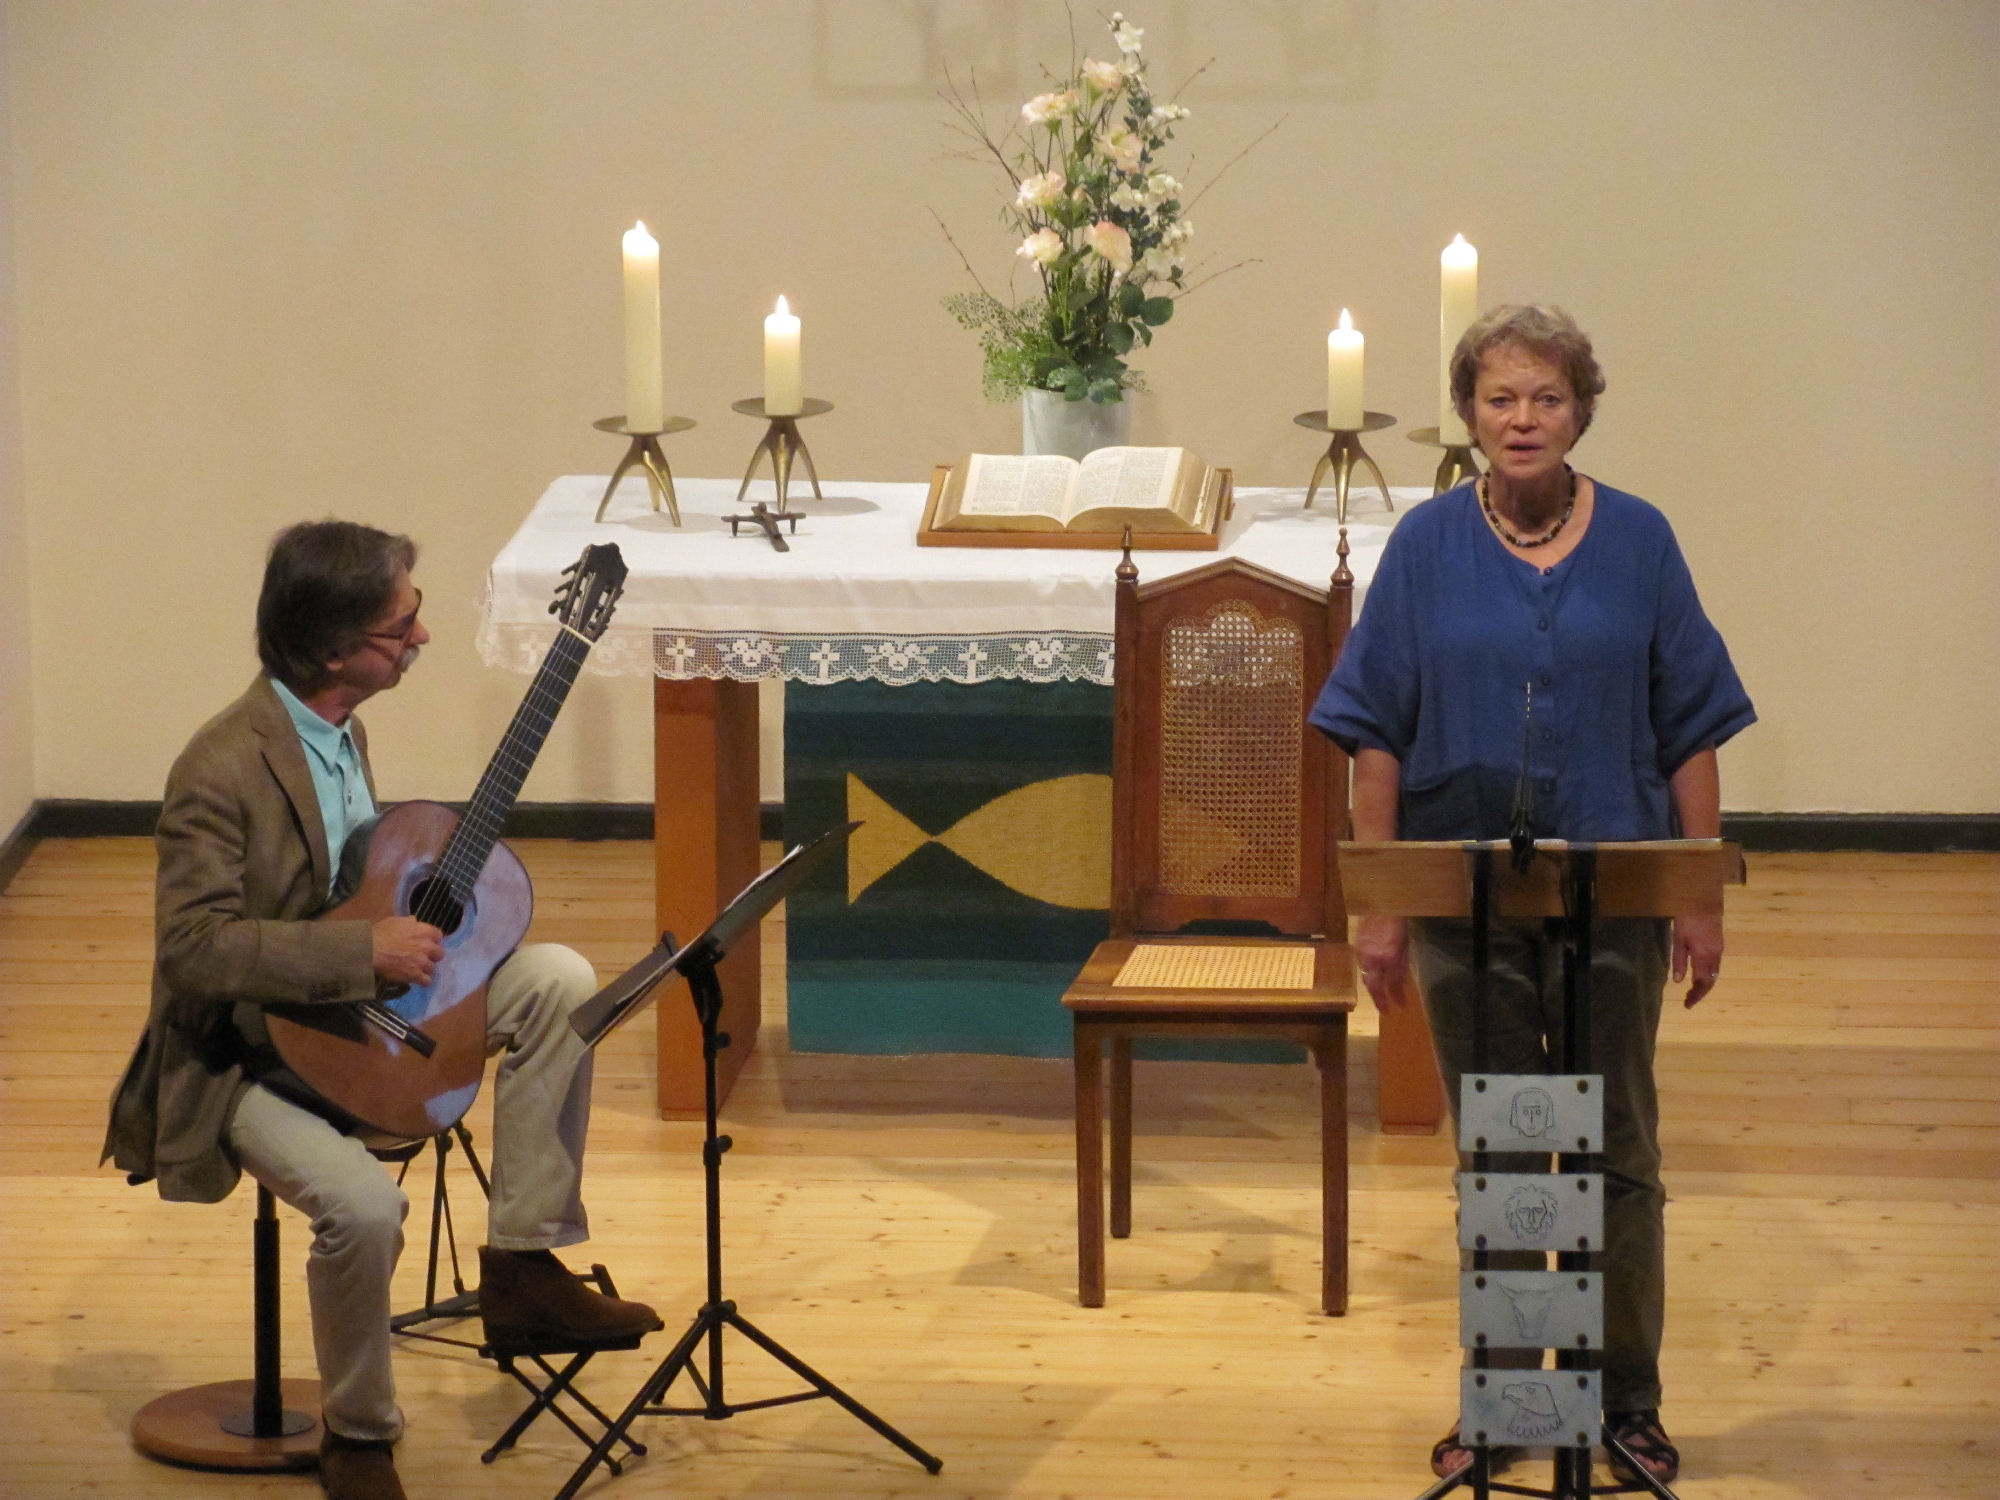 Sabina Burtzlaff (Stimme), Volker Linde (Gitarre)